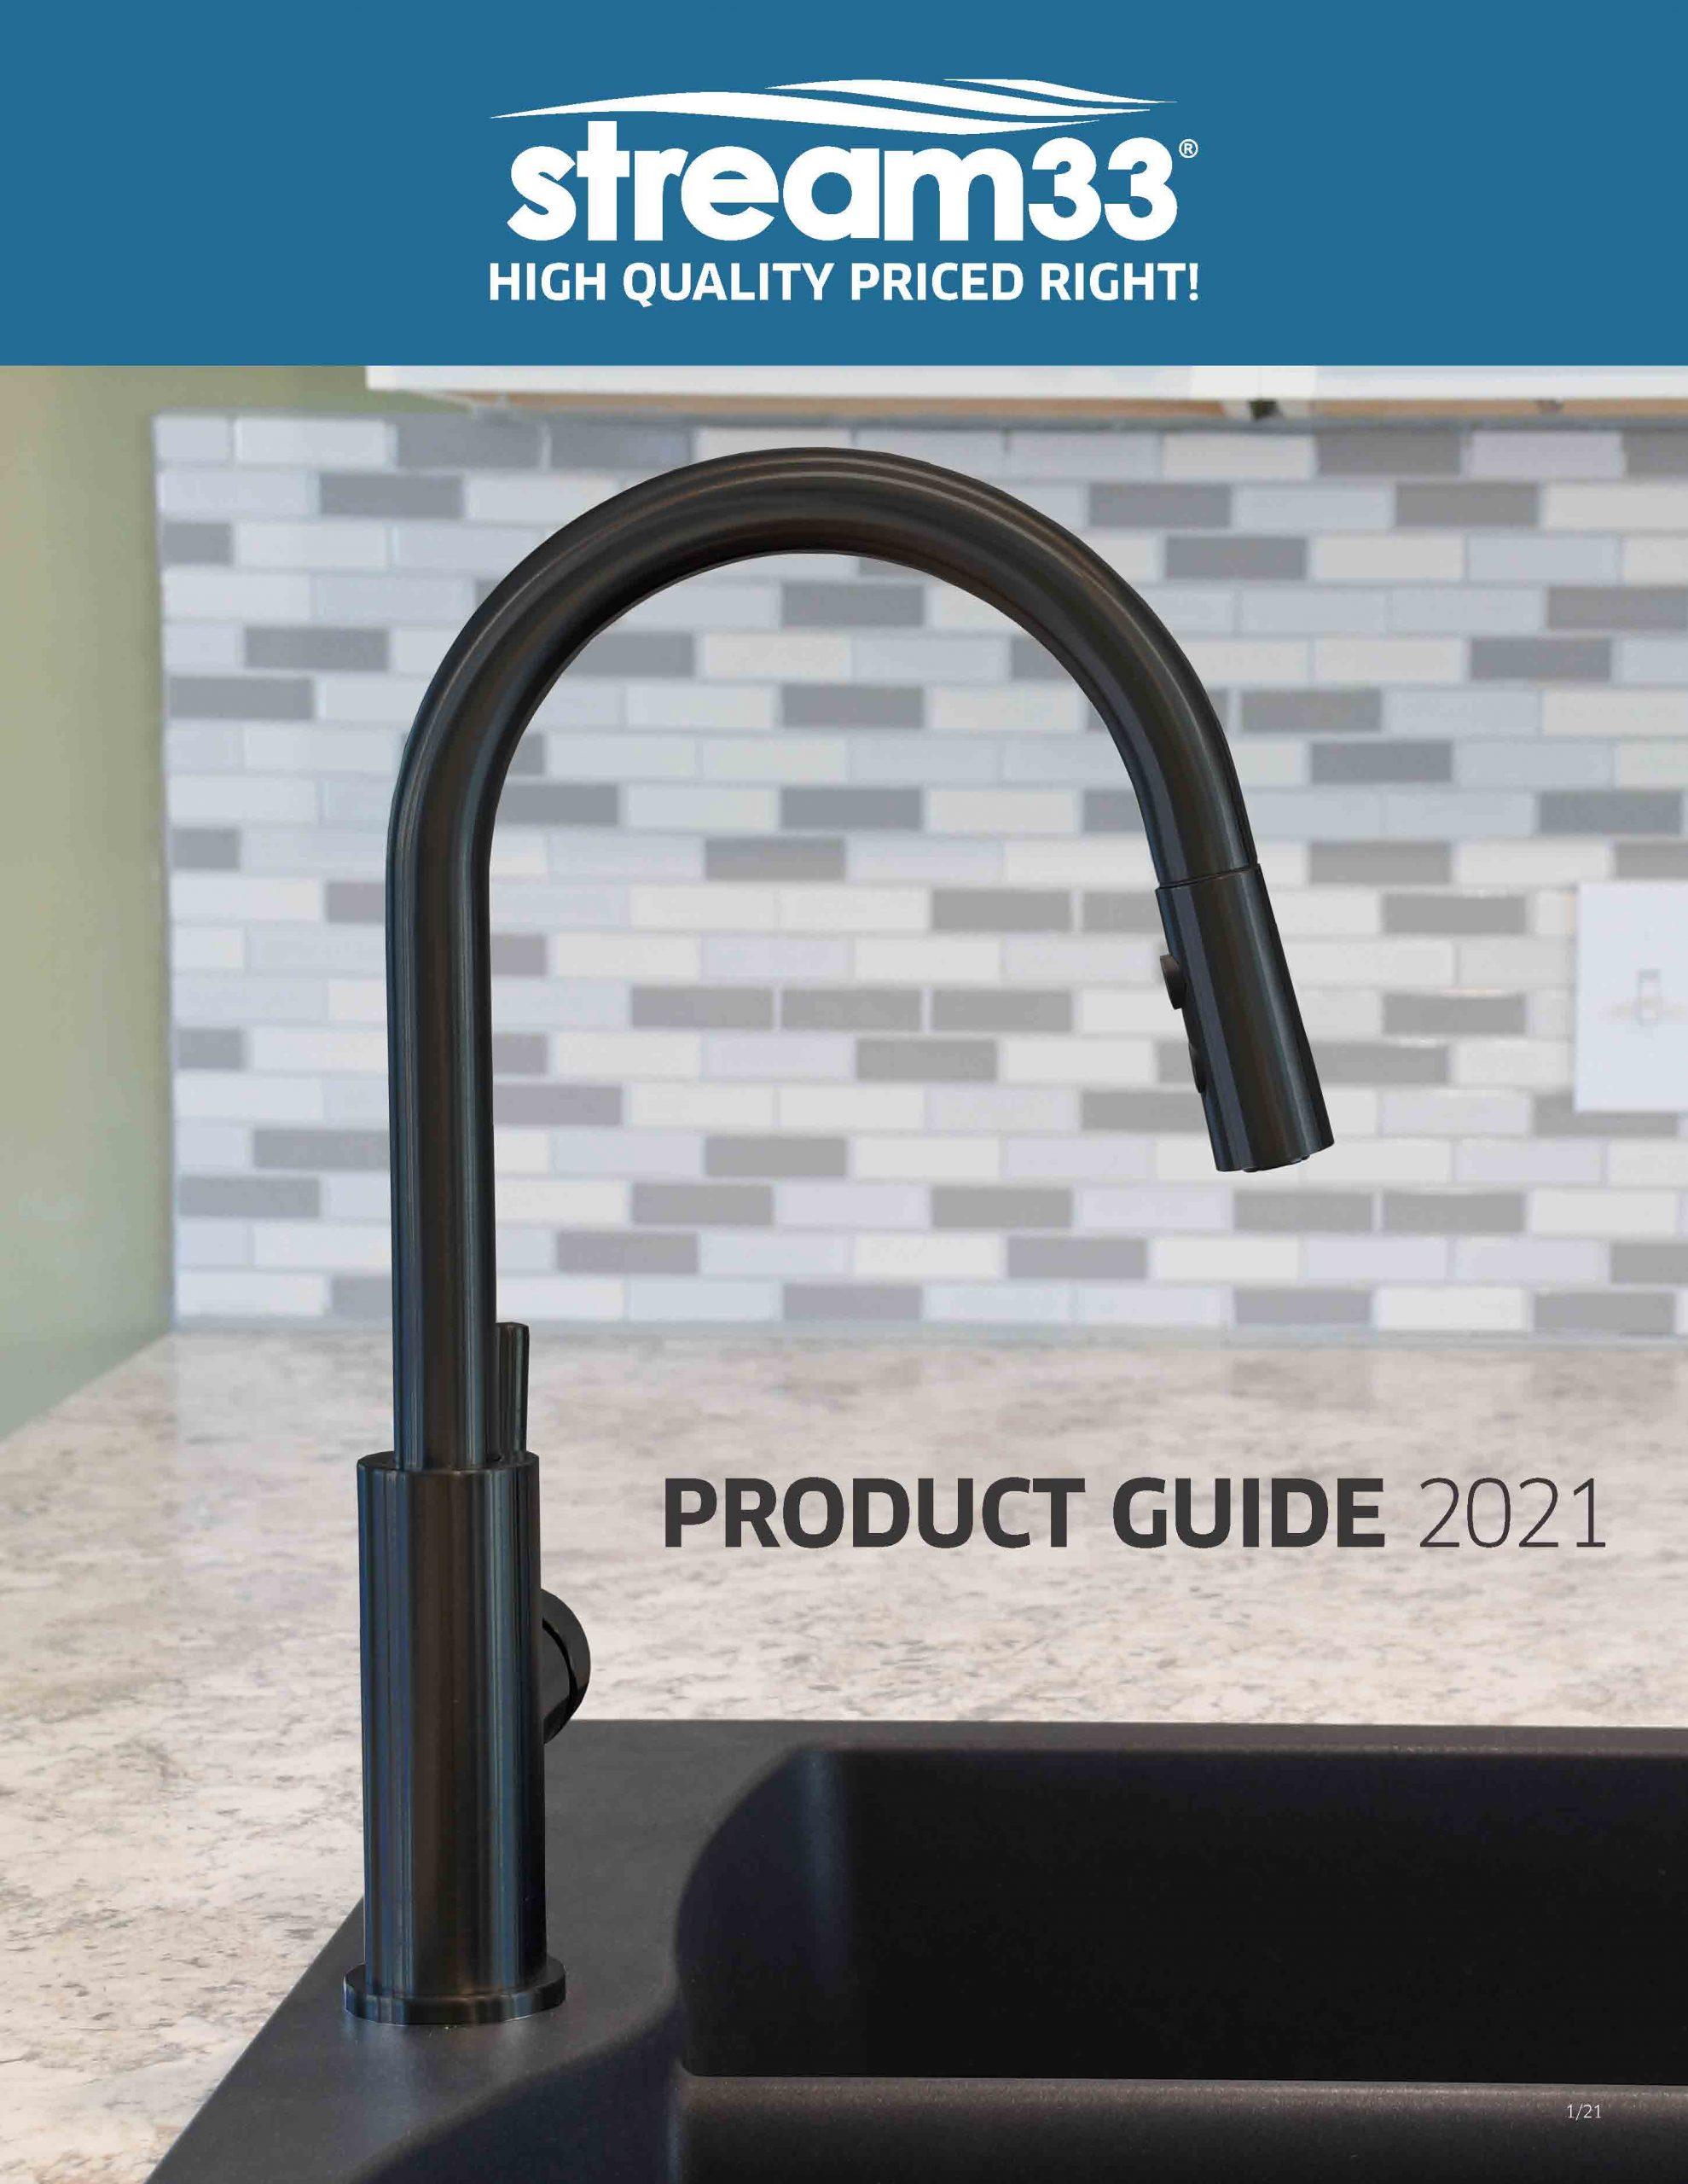 Stream33 Product Brochure